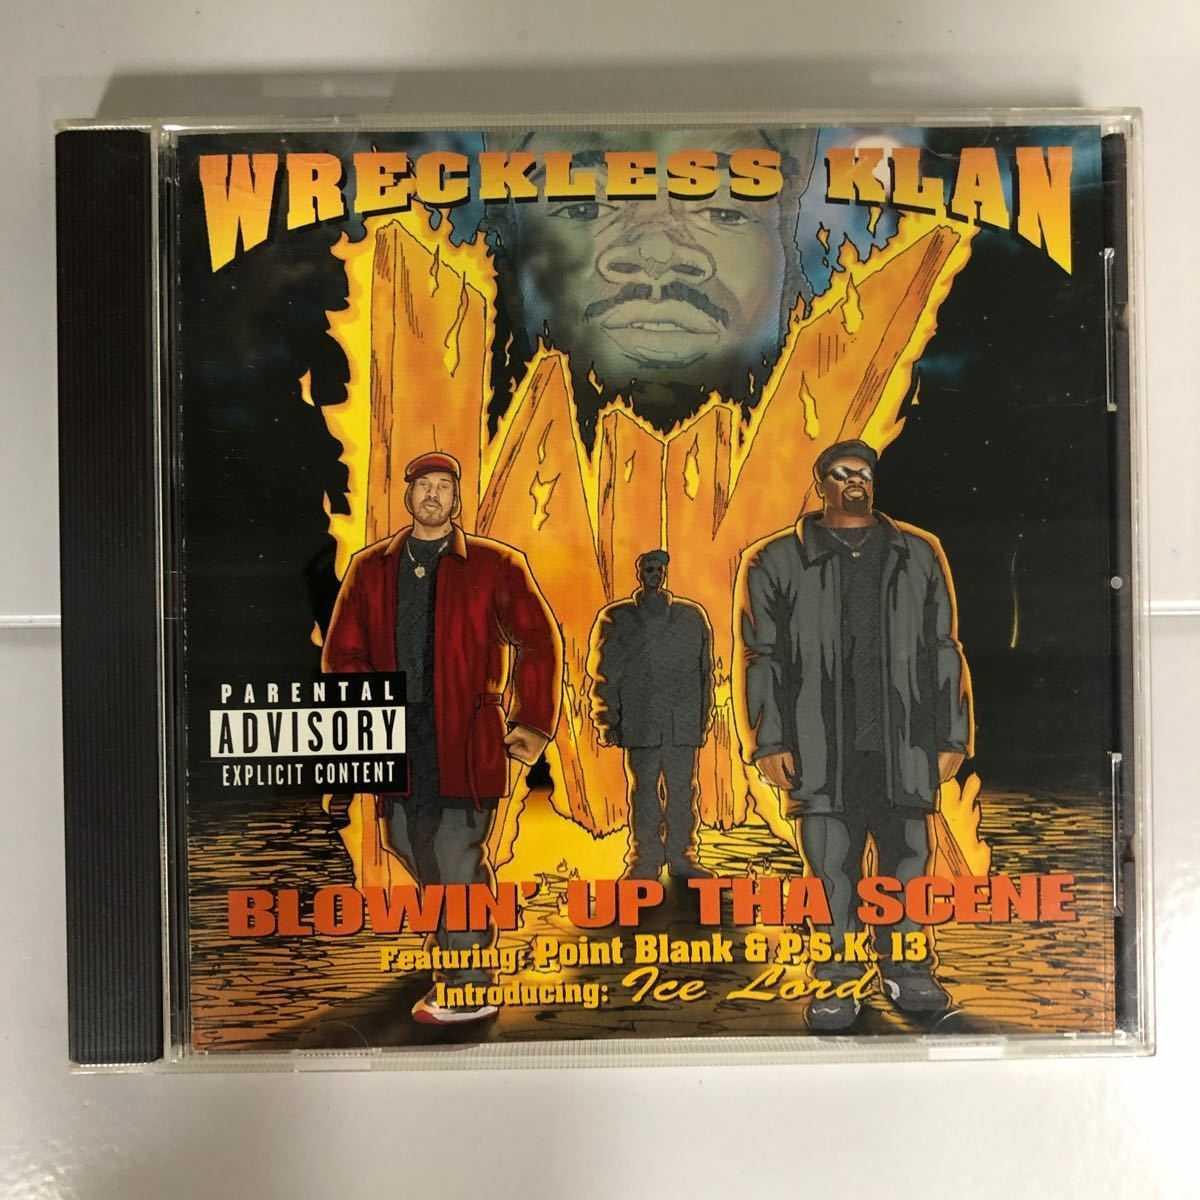 【G Rap / 送料無料】】WRECKLESS KLAN